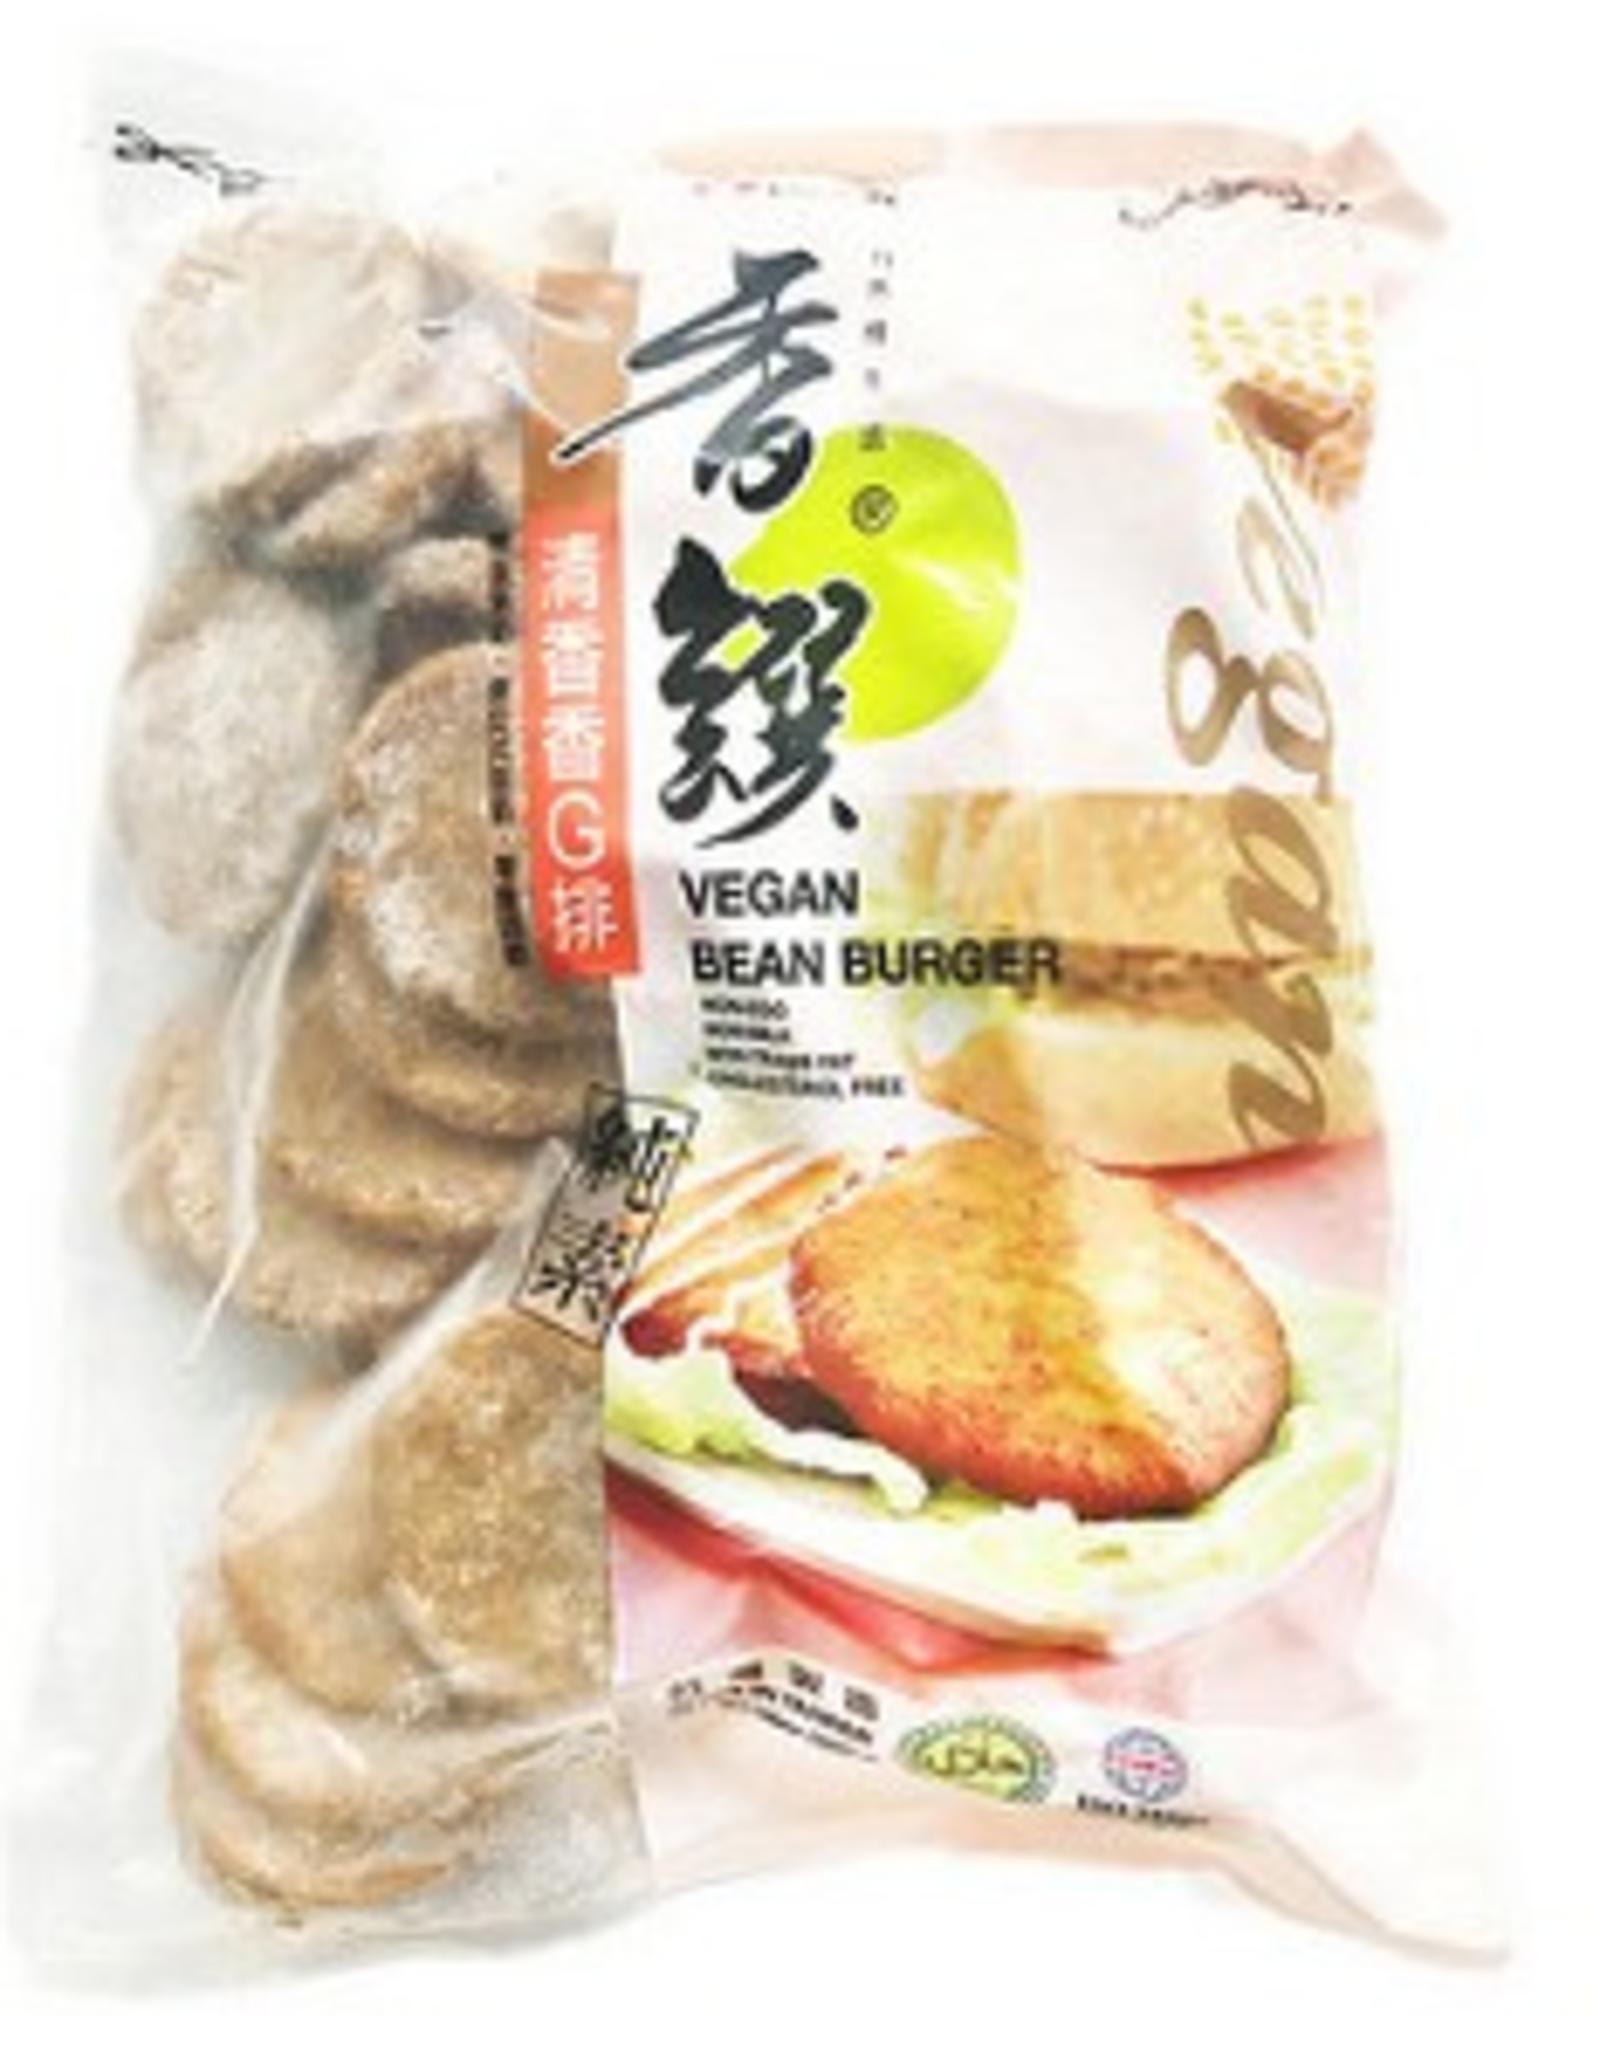 Chyuan Kuang * 全廣 (CK) Vegan Chicken Burger (L)*(香饌) 全素香雞排 (L)